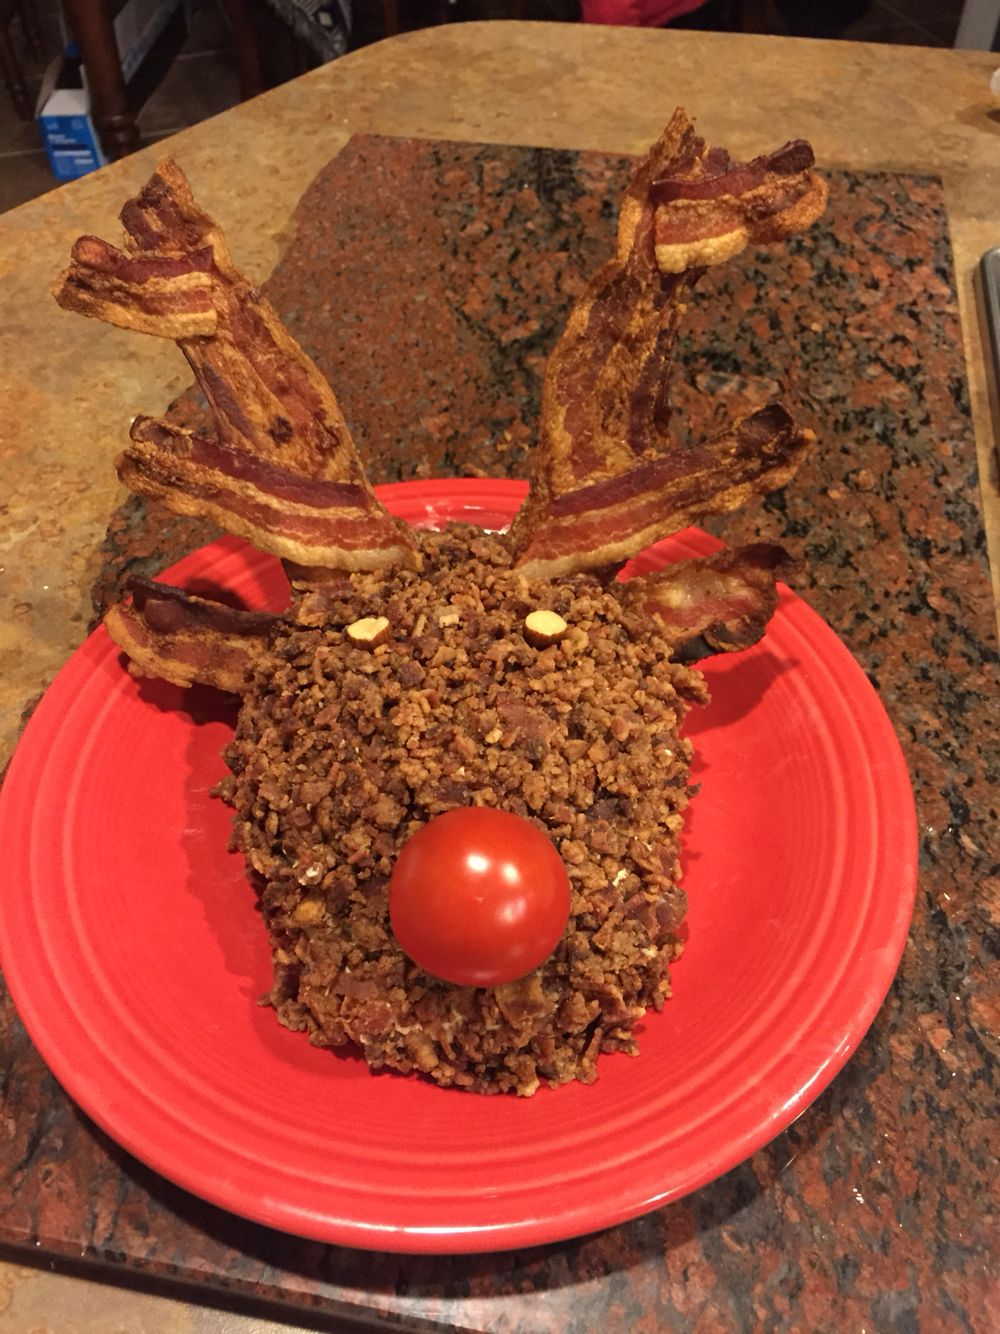 Reindeer rudolf bacon cheeseball recipes pinterest bacon christmas desserts forumfinder Choice Image